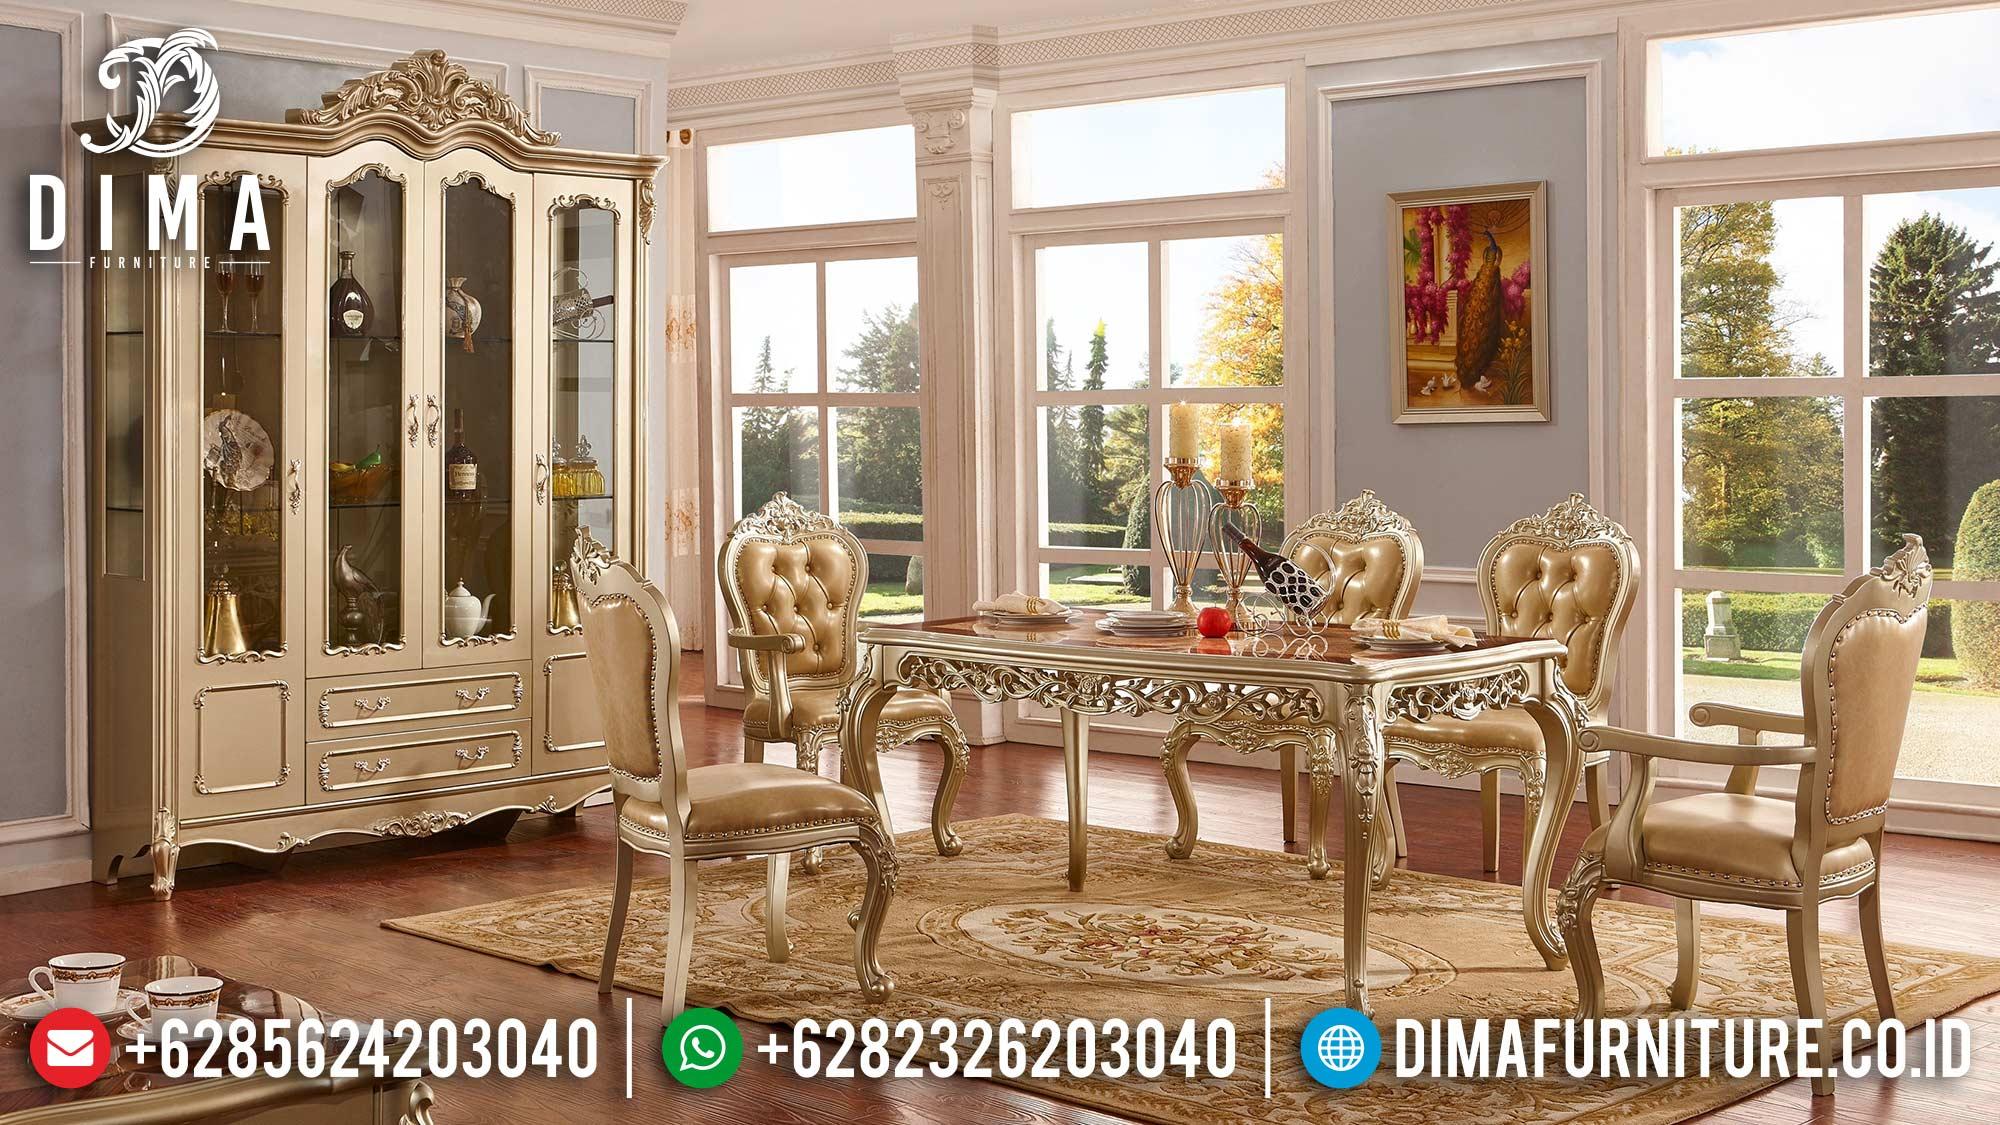 High Class Desain Meja Makan Mewah Excellent Golden Duco Glossy Color TTJ-1605